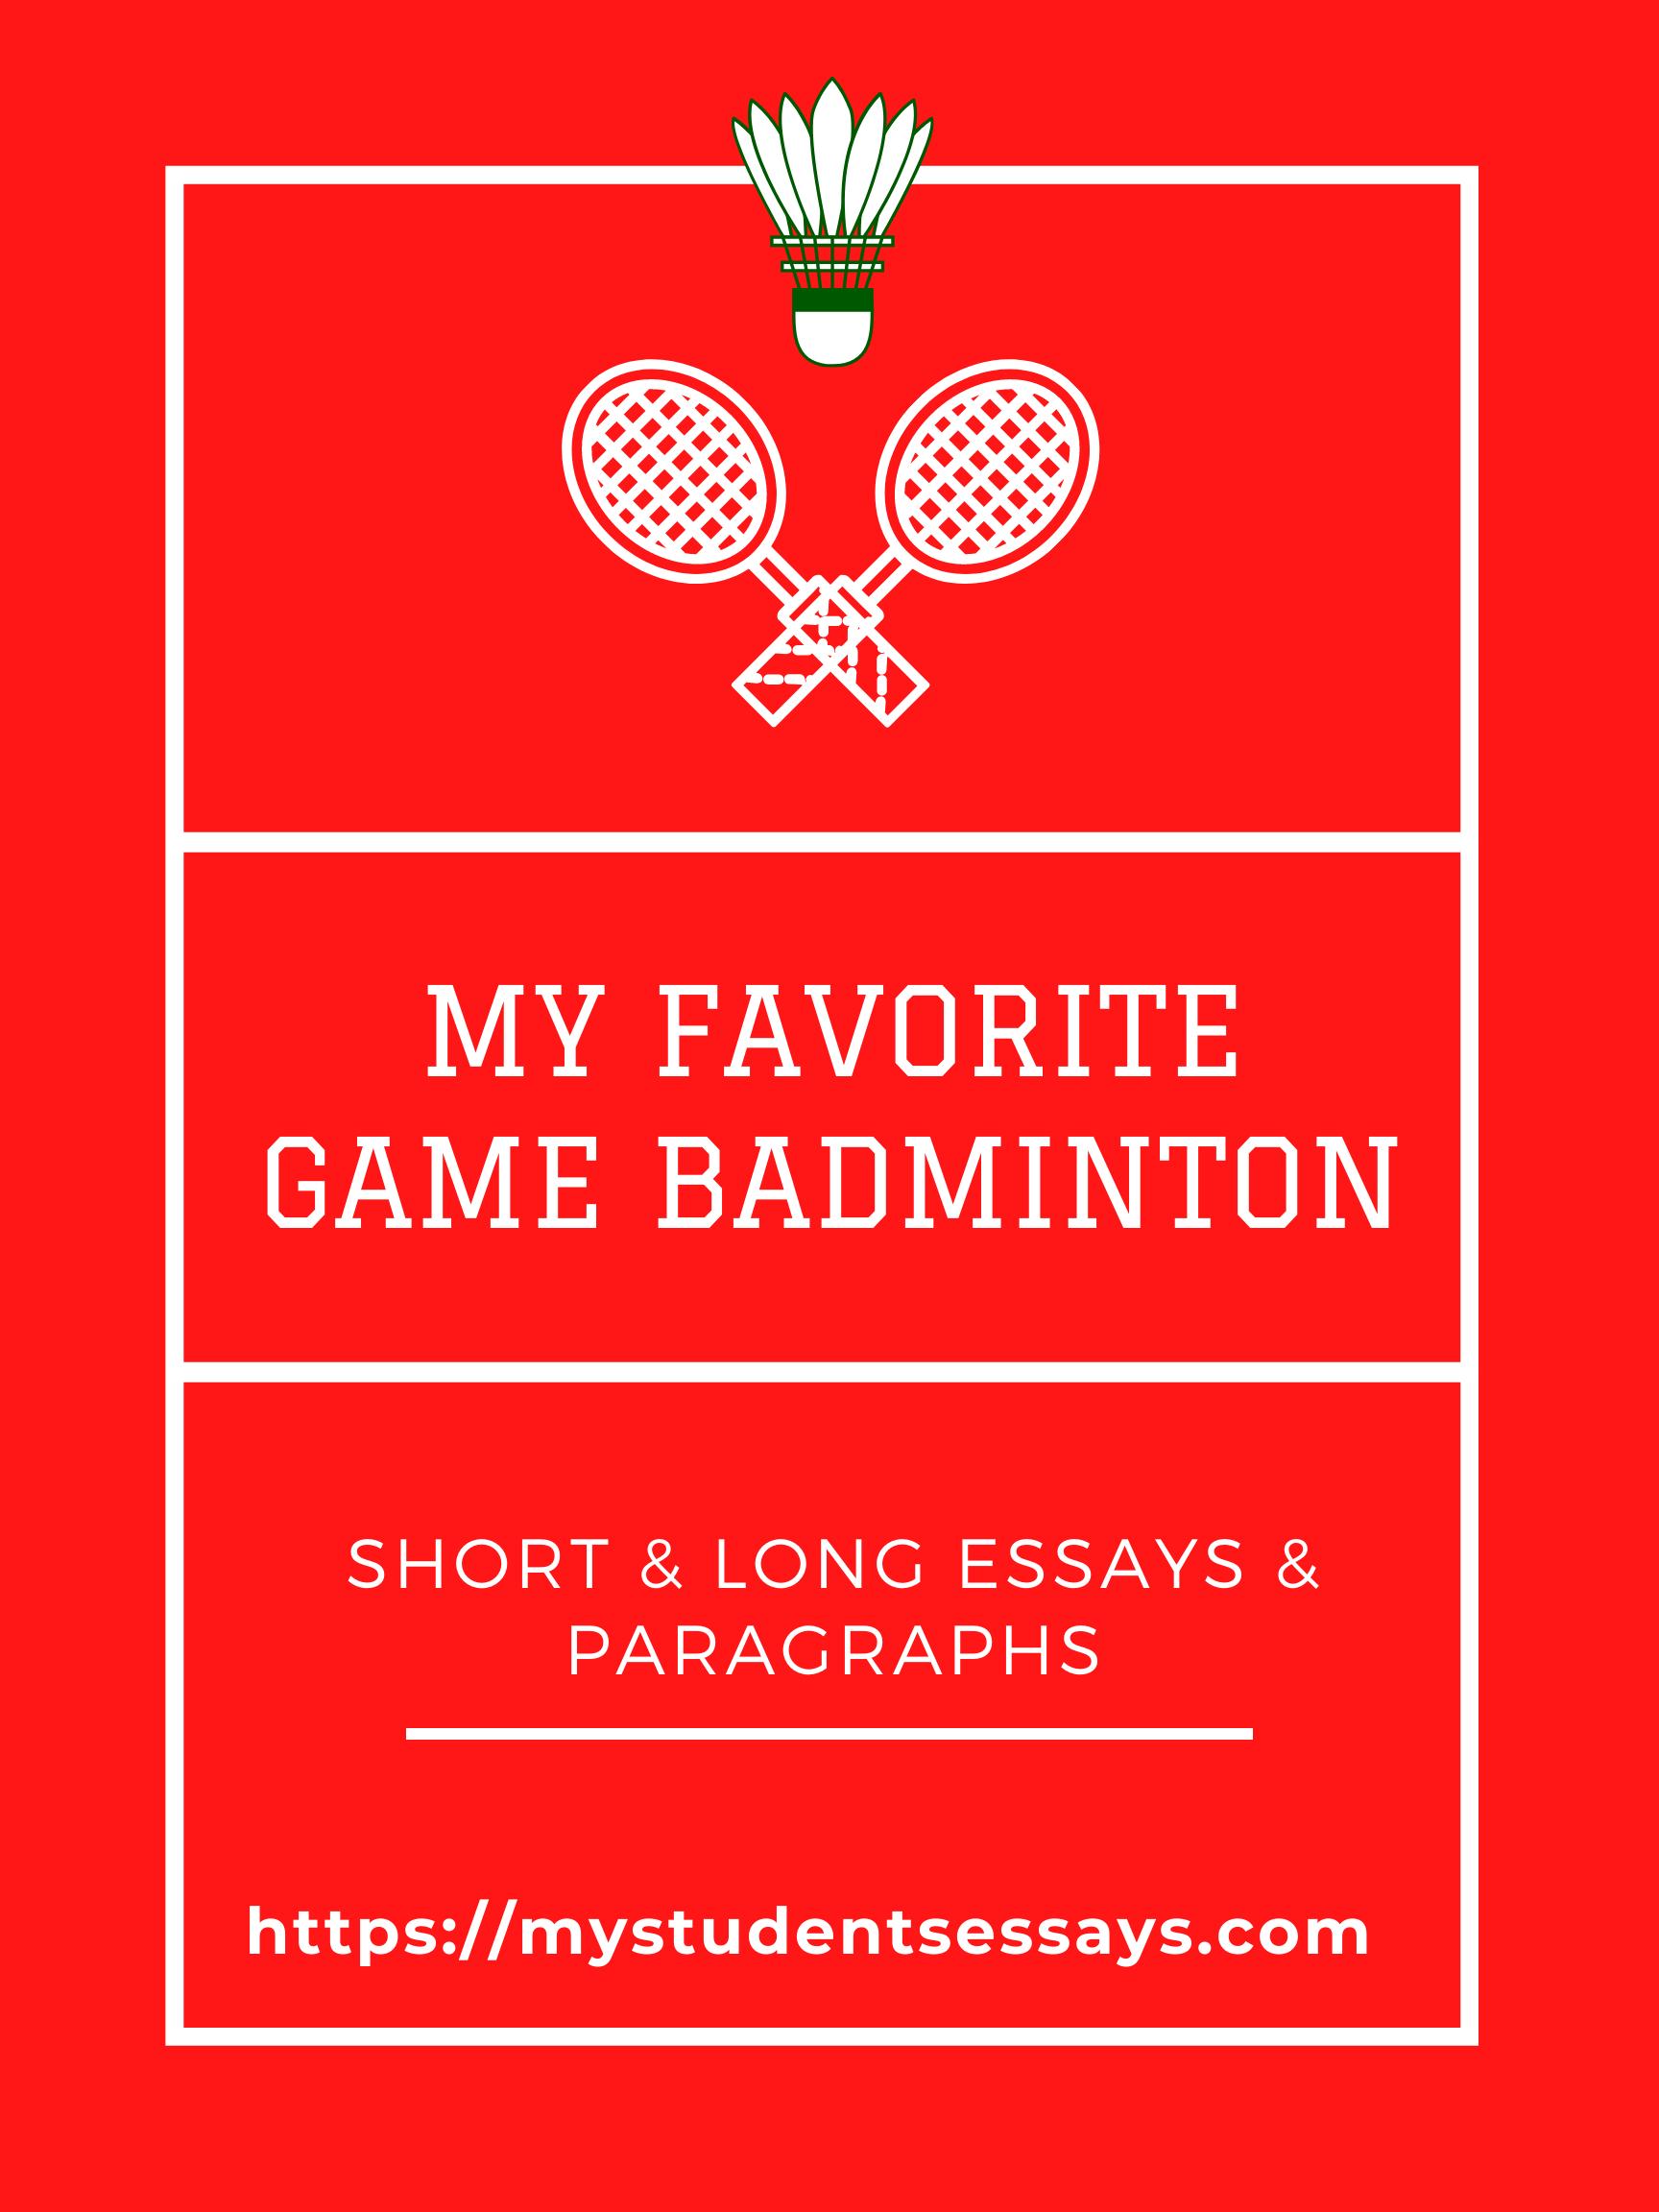 My favorite Game Badminton Essay